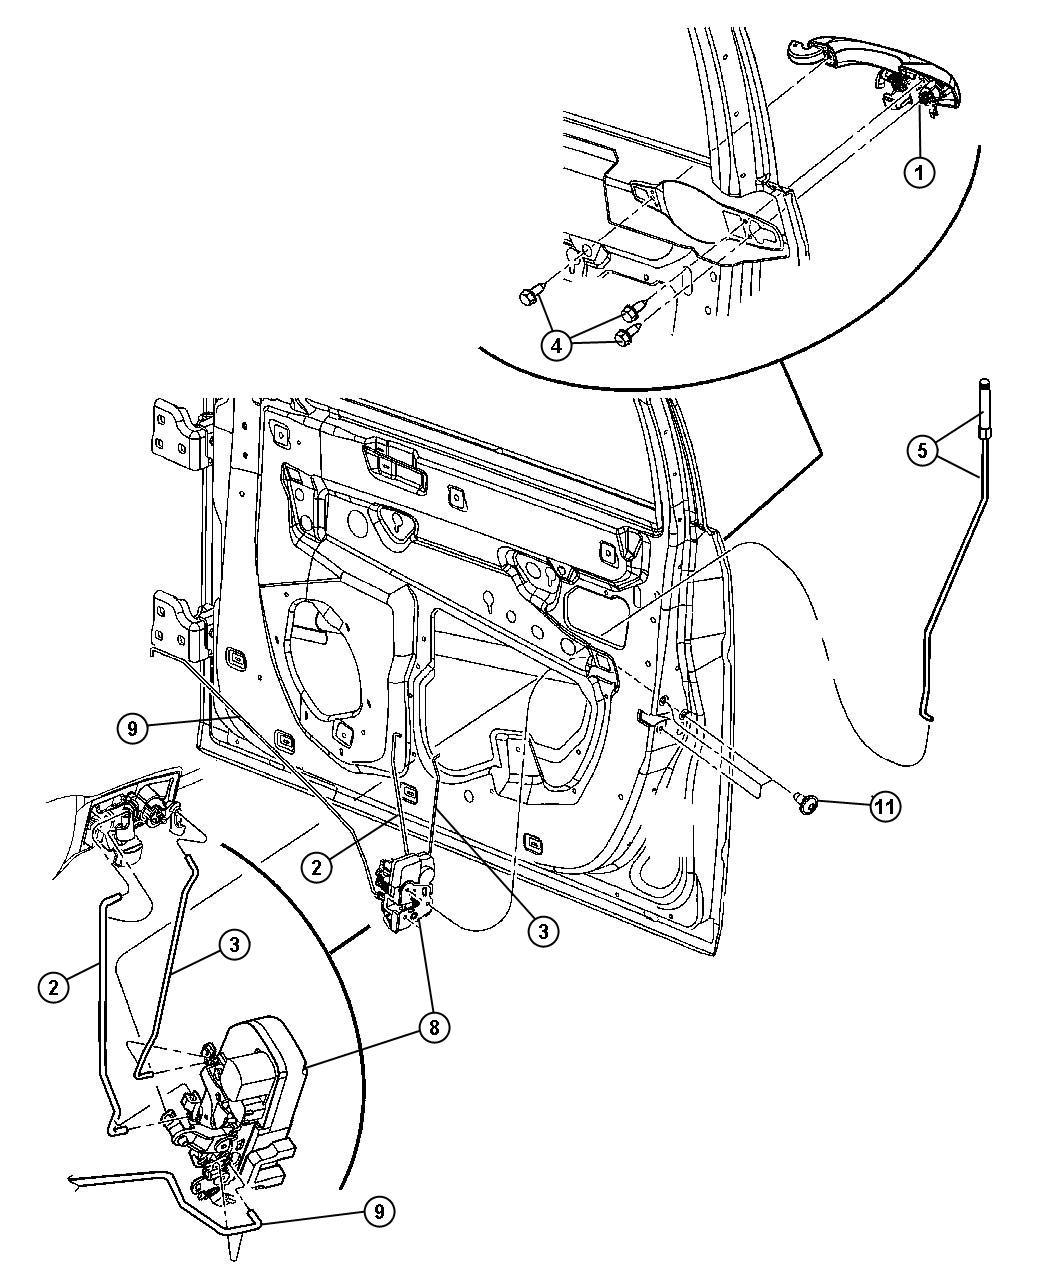 Chrysler 300 Clip Latch Link White Inside Remote